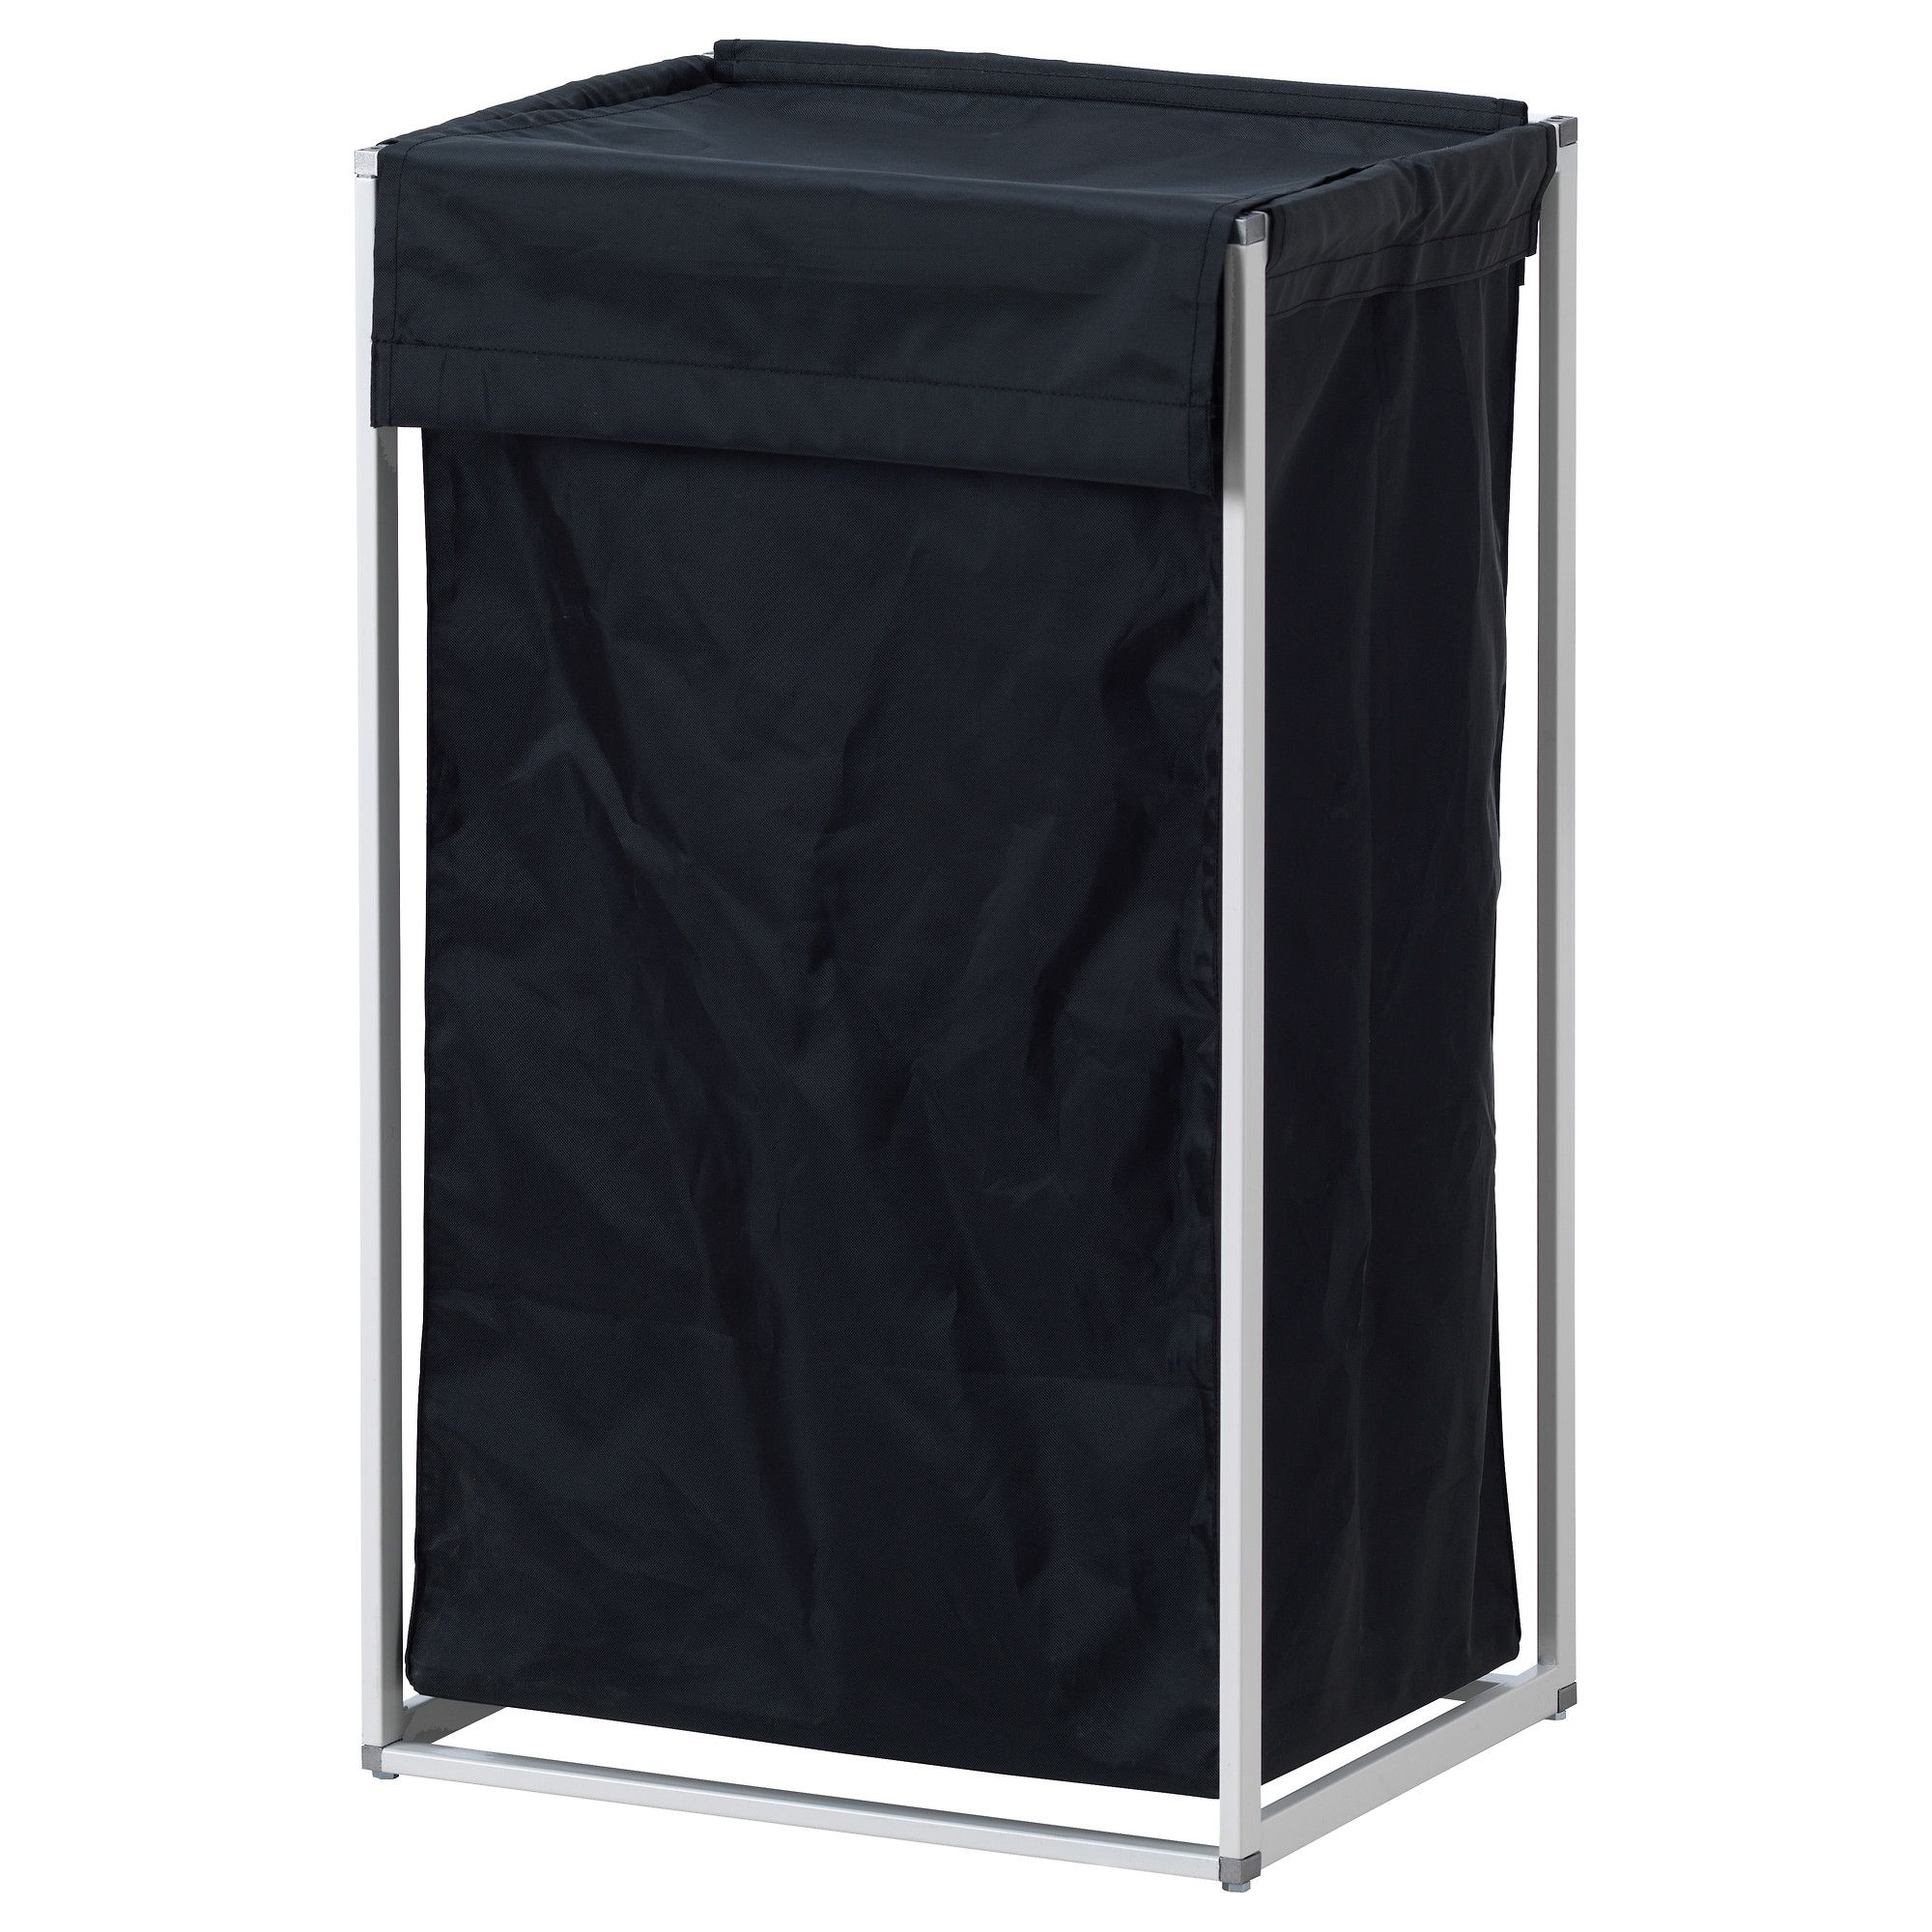 ANTONIUS Laundry bag with stand, black   IKEA $12.99   Organize Me ...